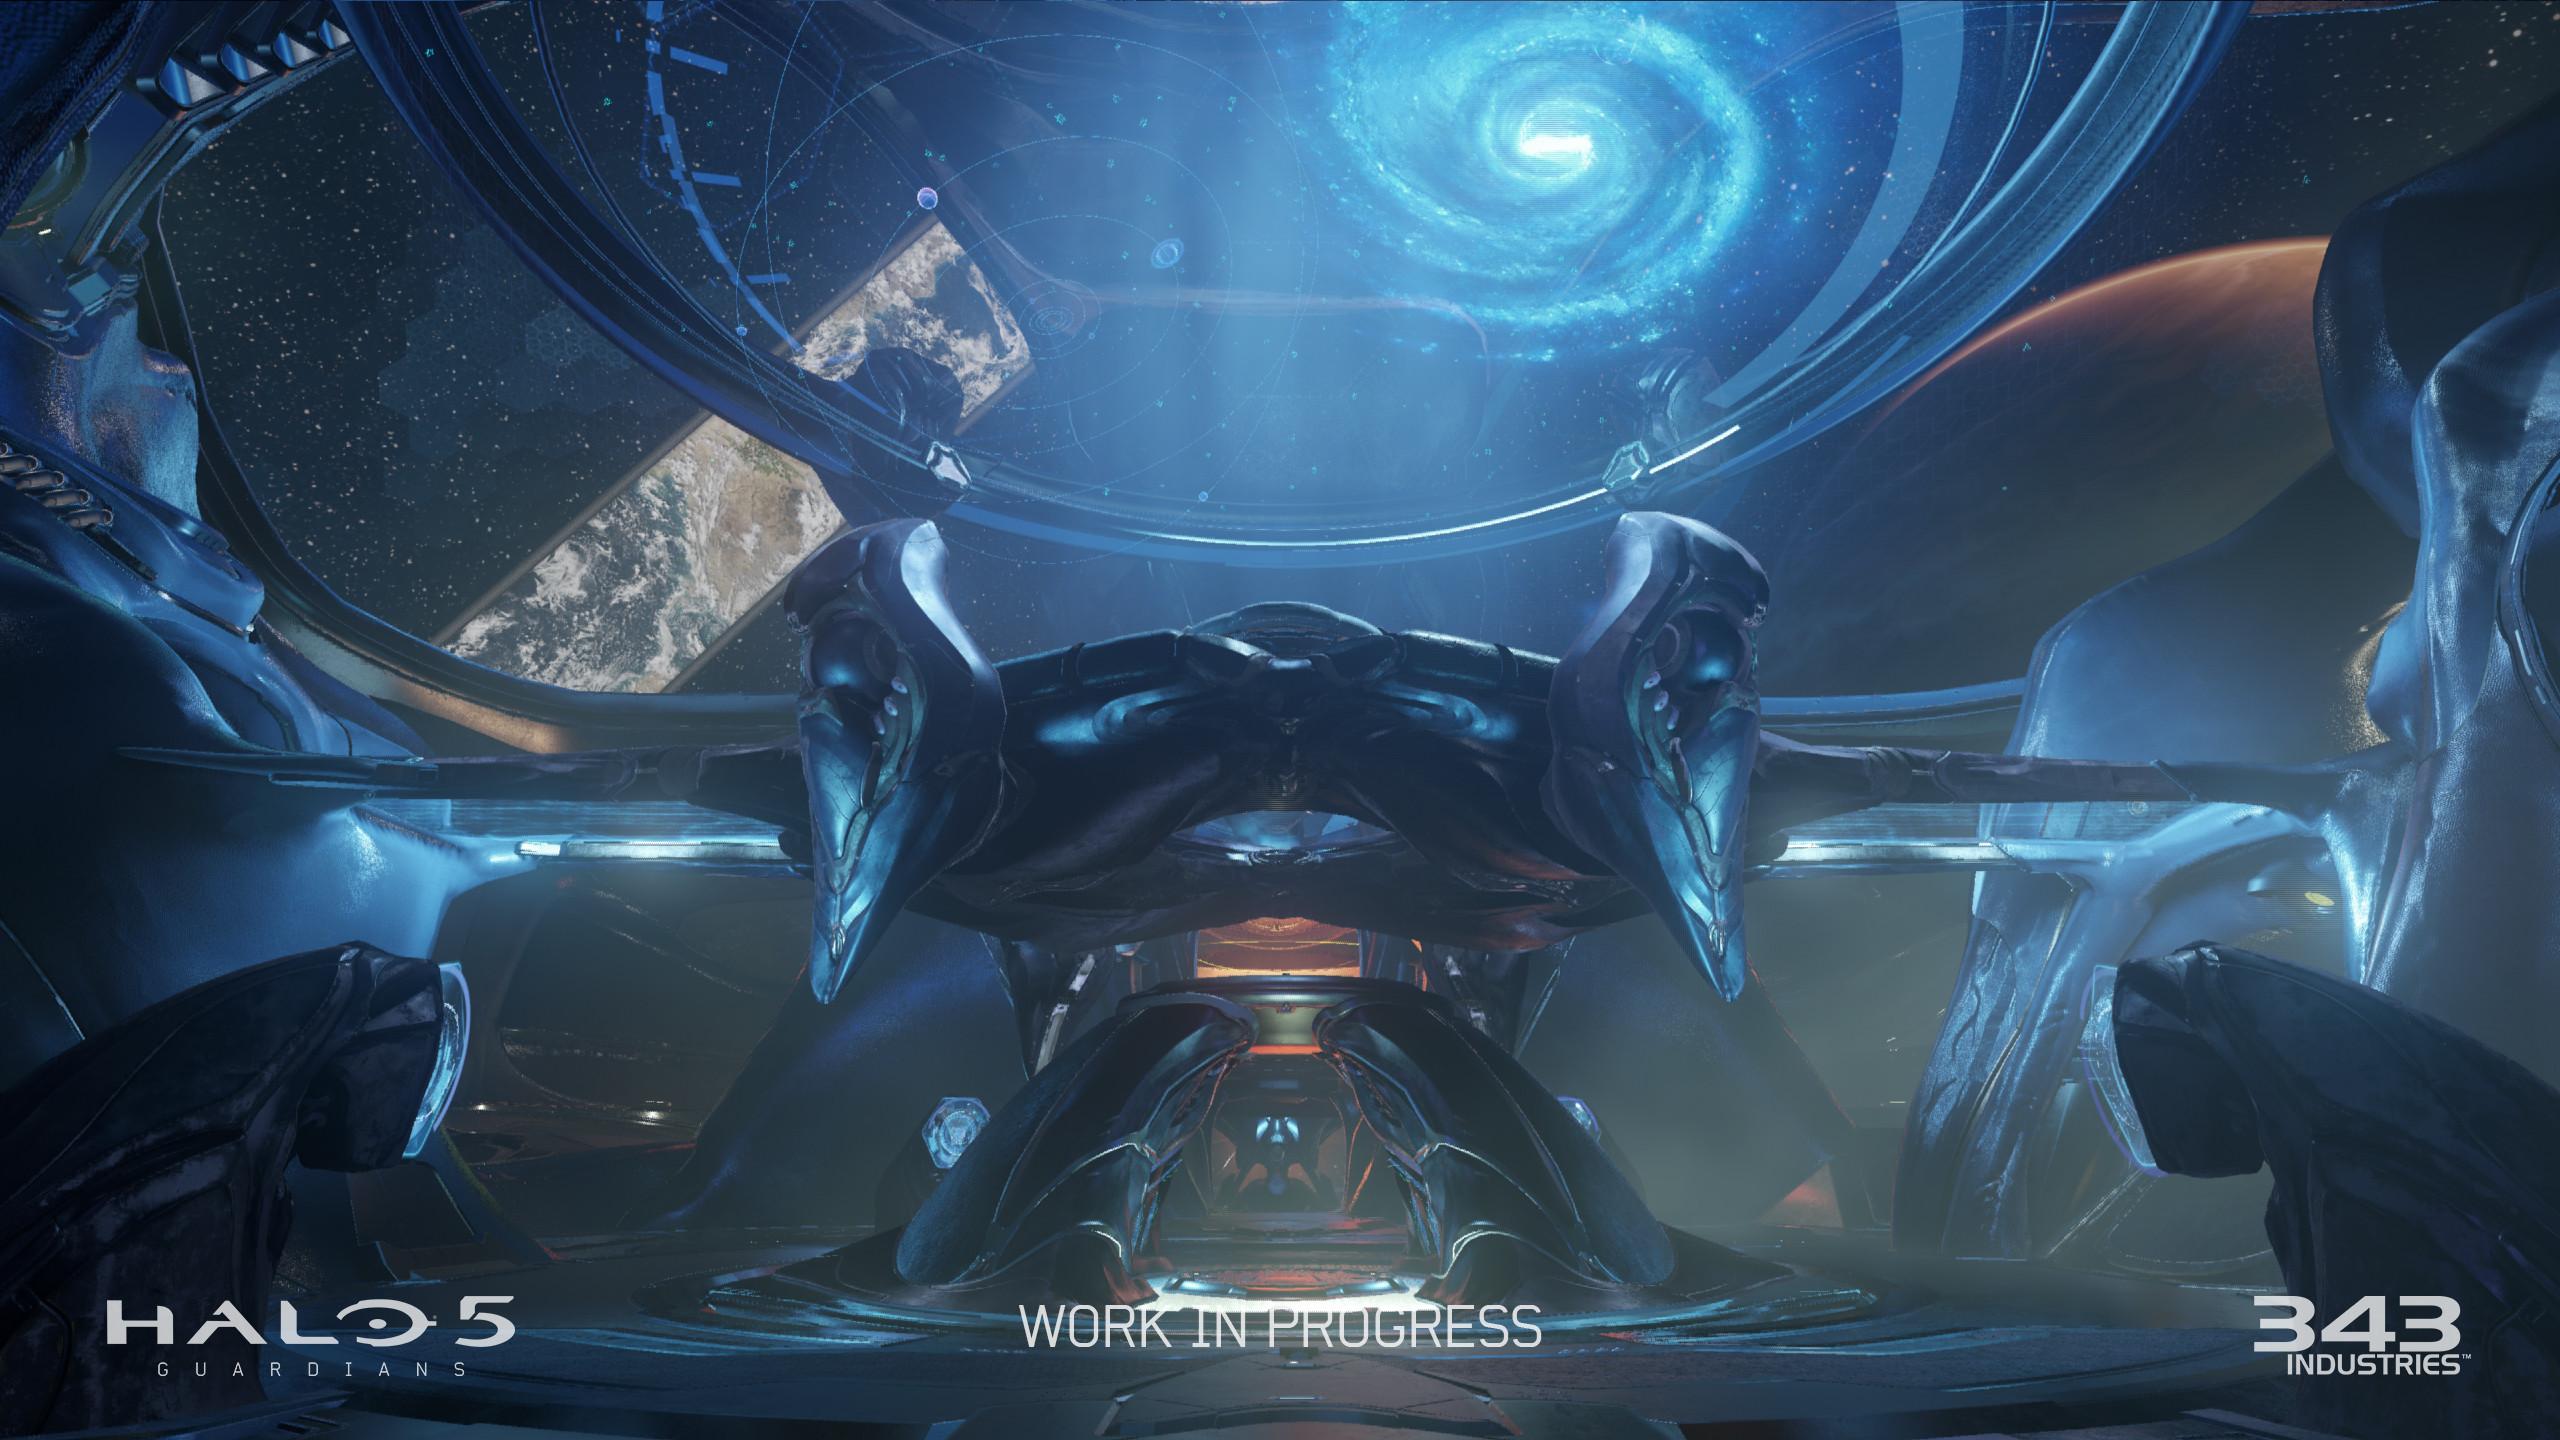 Res: 2560x1440, Halo 5 Guardians Computer Wallpapers Desktop Backgrounds